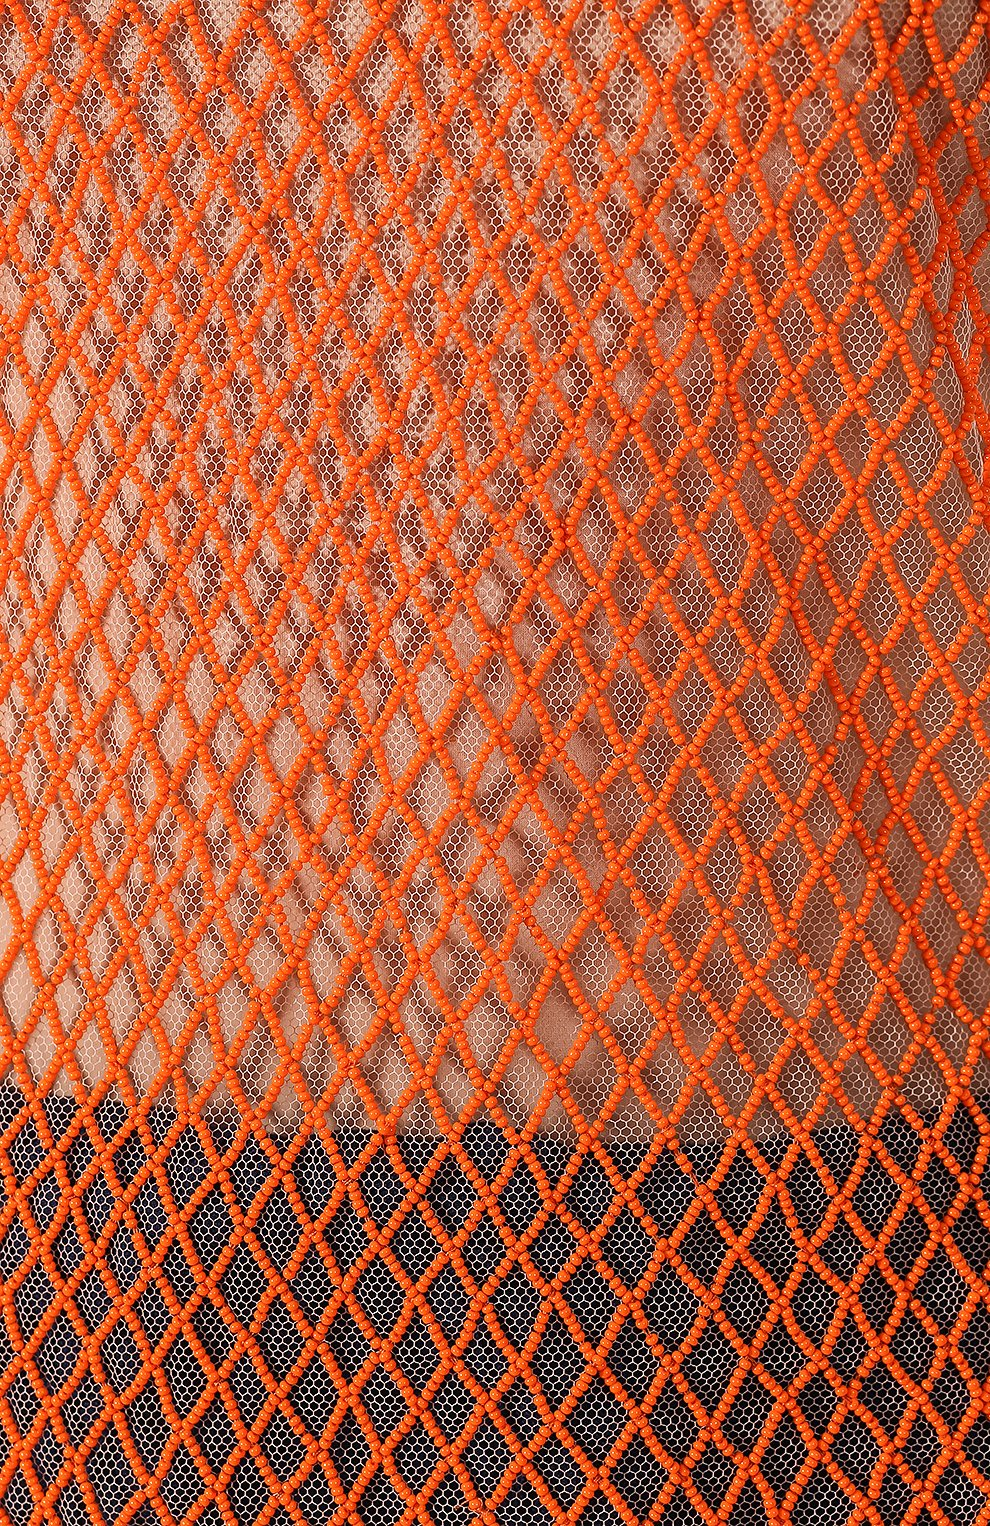 Топ Dries Van Noten оранжевый   Фото №5